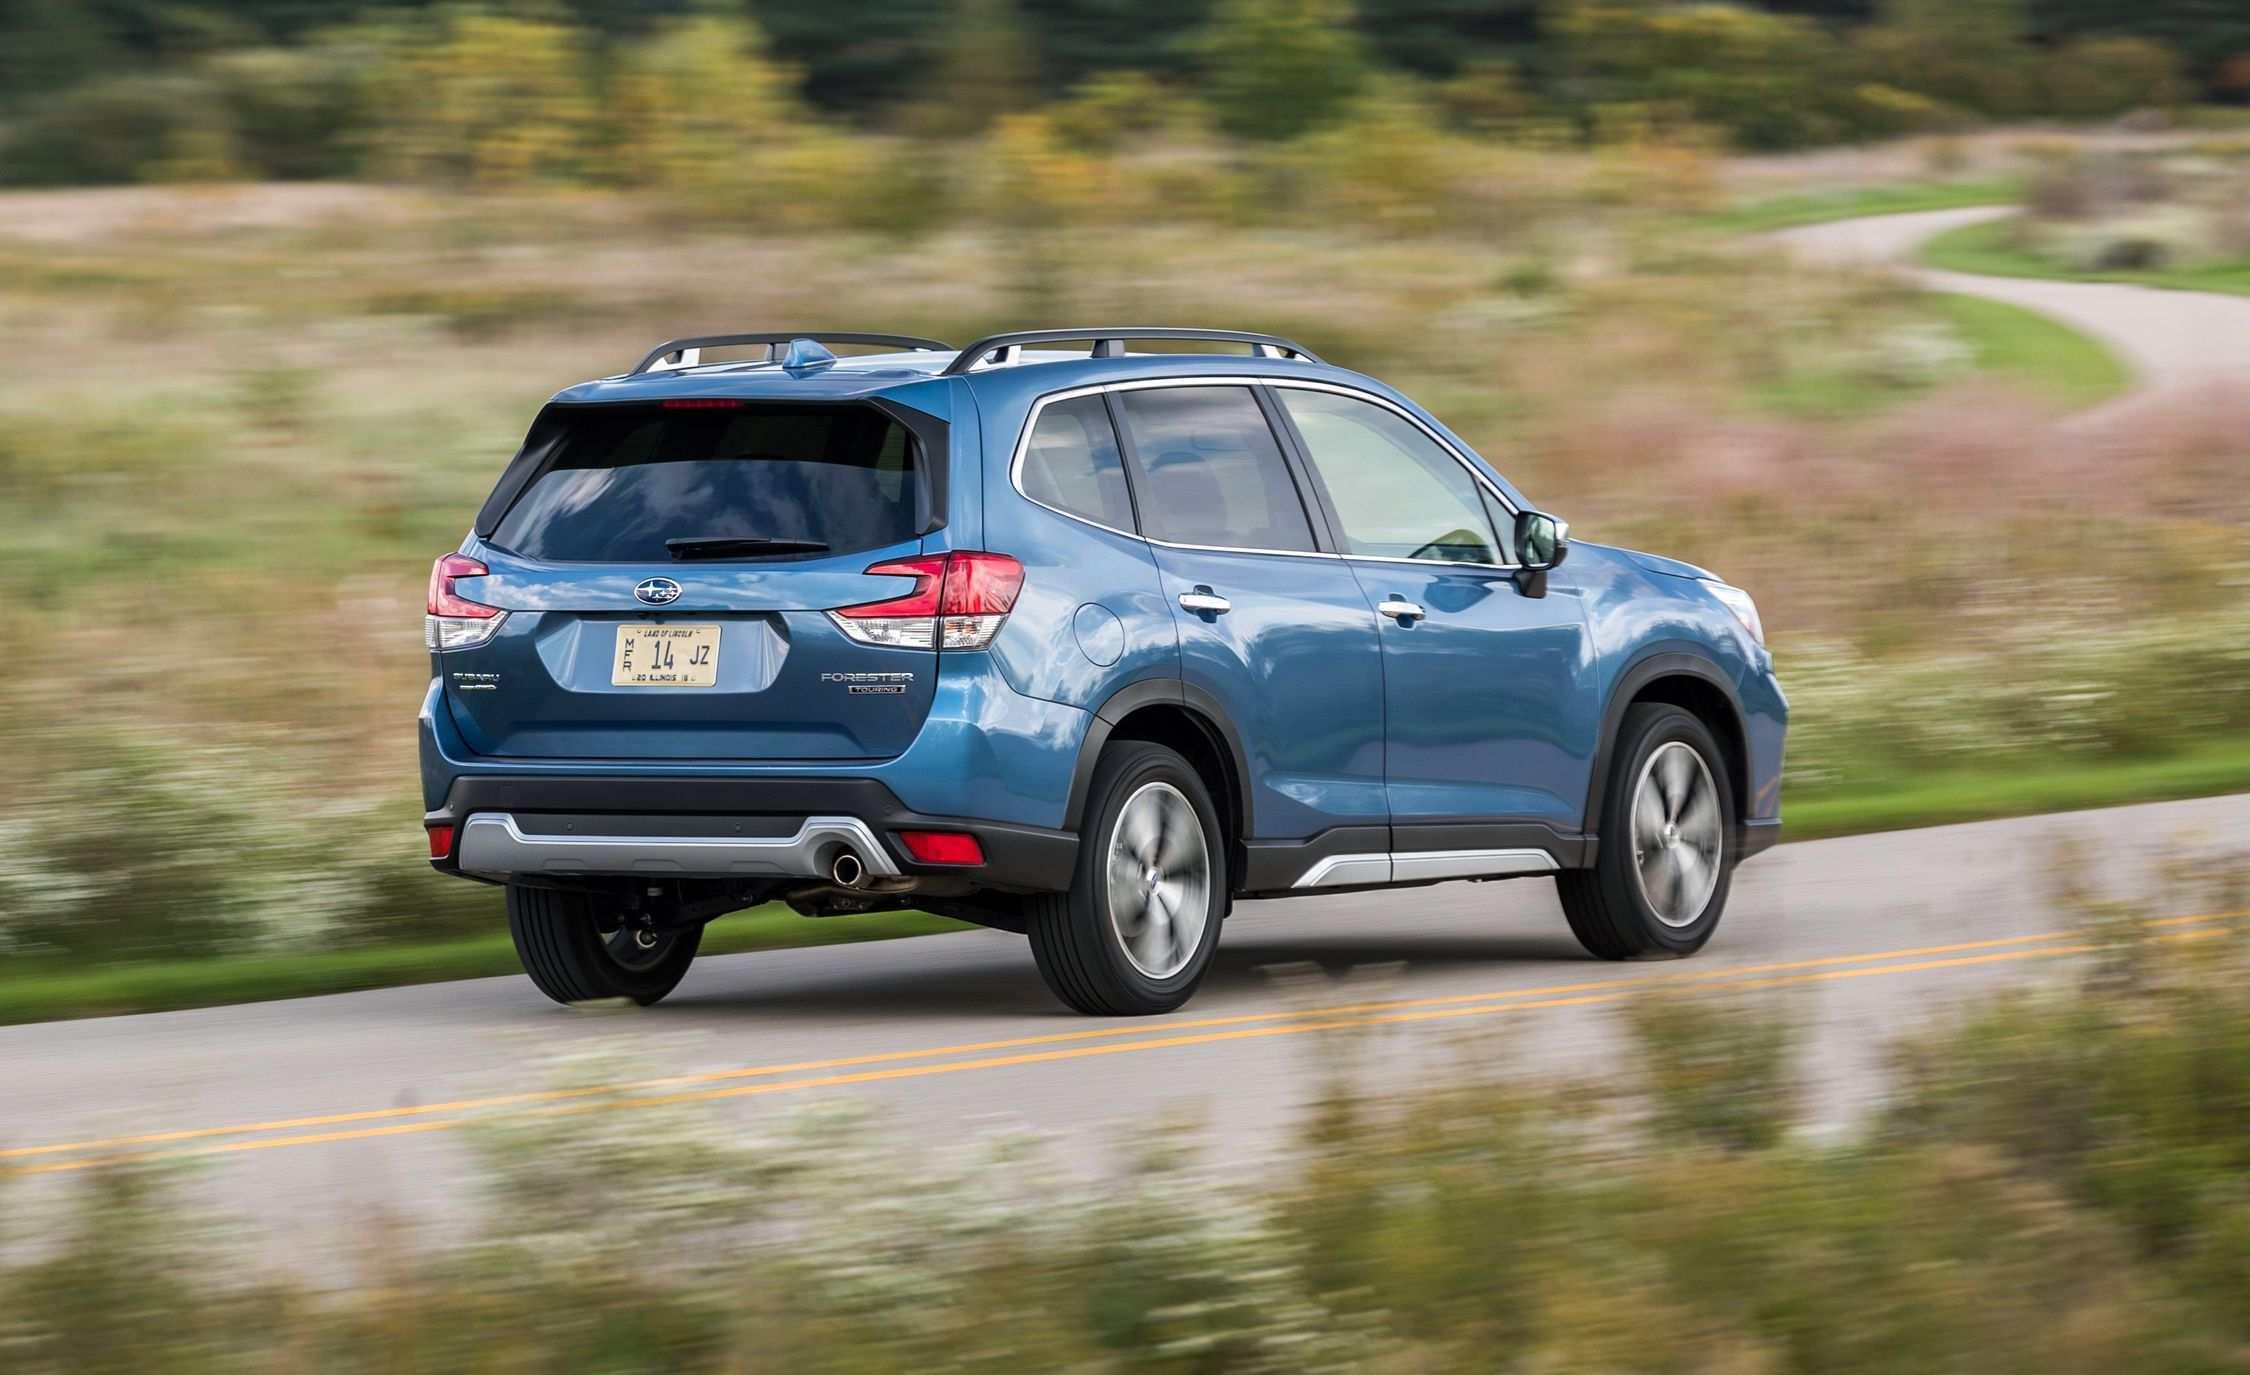 67 Gallery of 2019 Subaru Updates Release Date by 2019 Subaru Updates